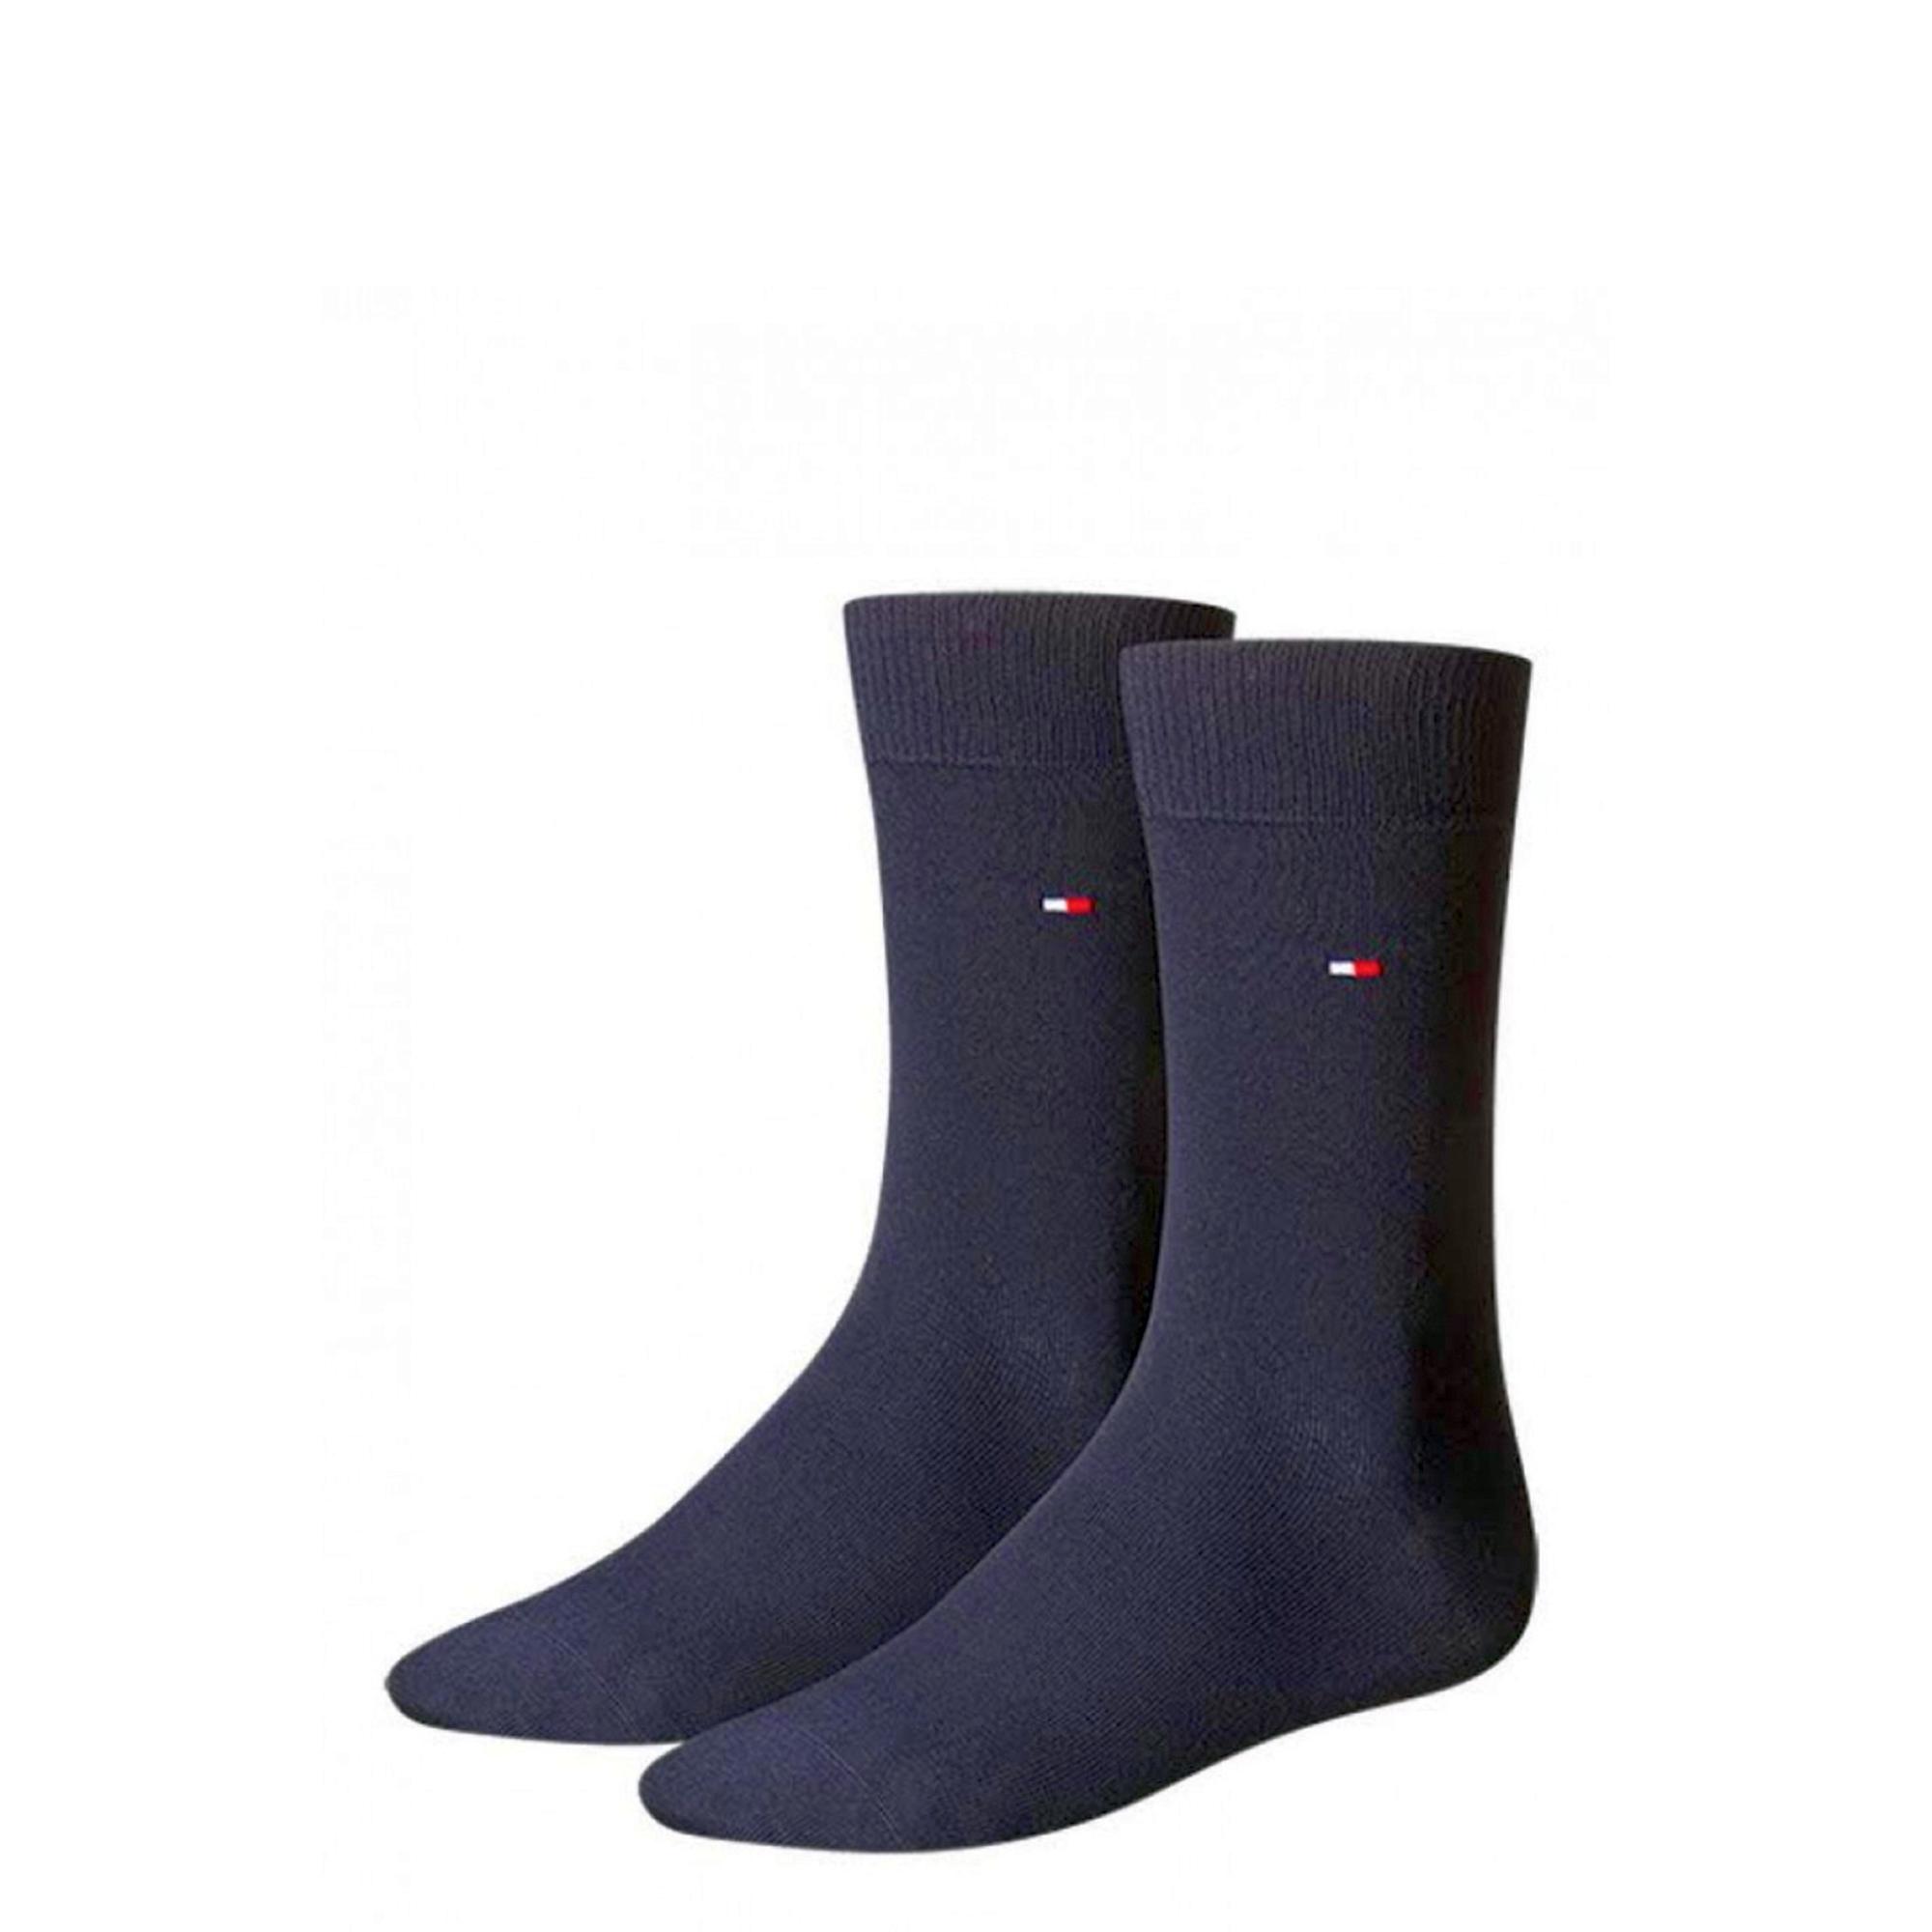 Tommy Hilfiger socks 371111 322 Dark navy